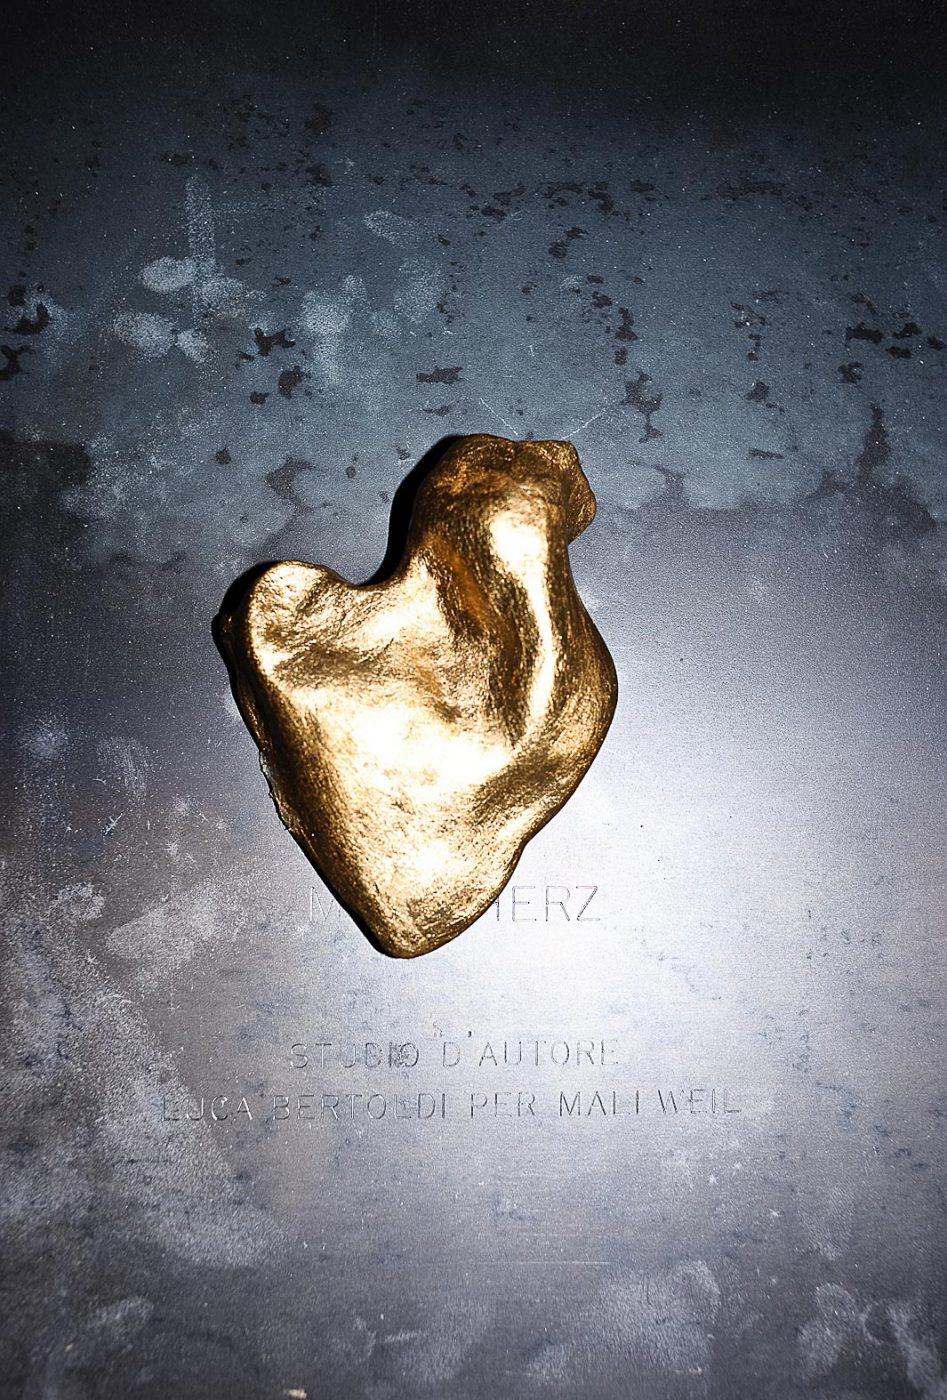 Mein herz - studio by Luca Bertoldi gold and ceramic